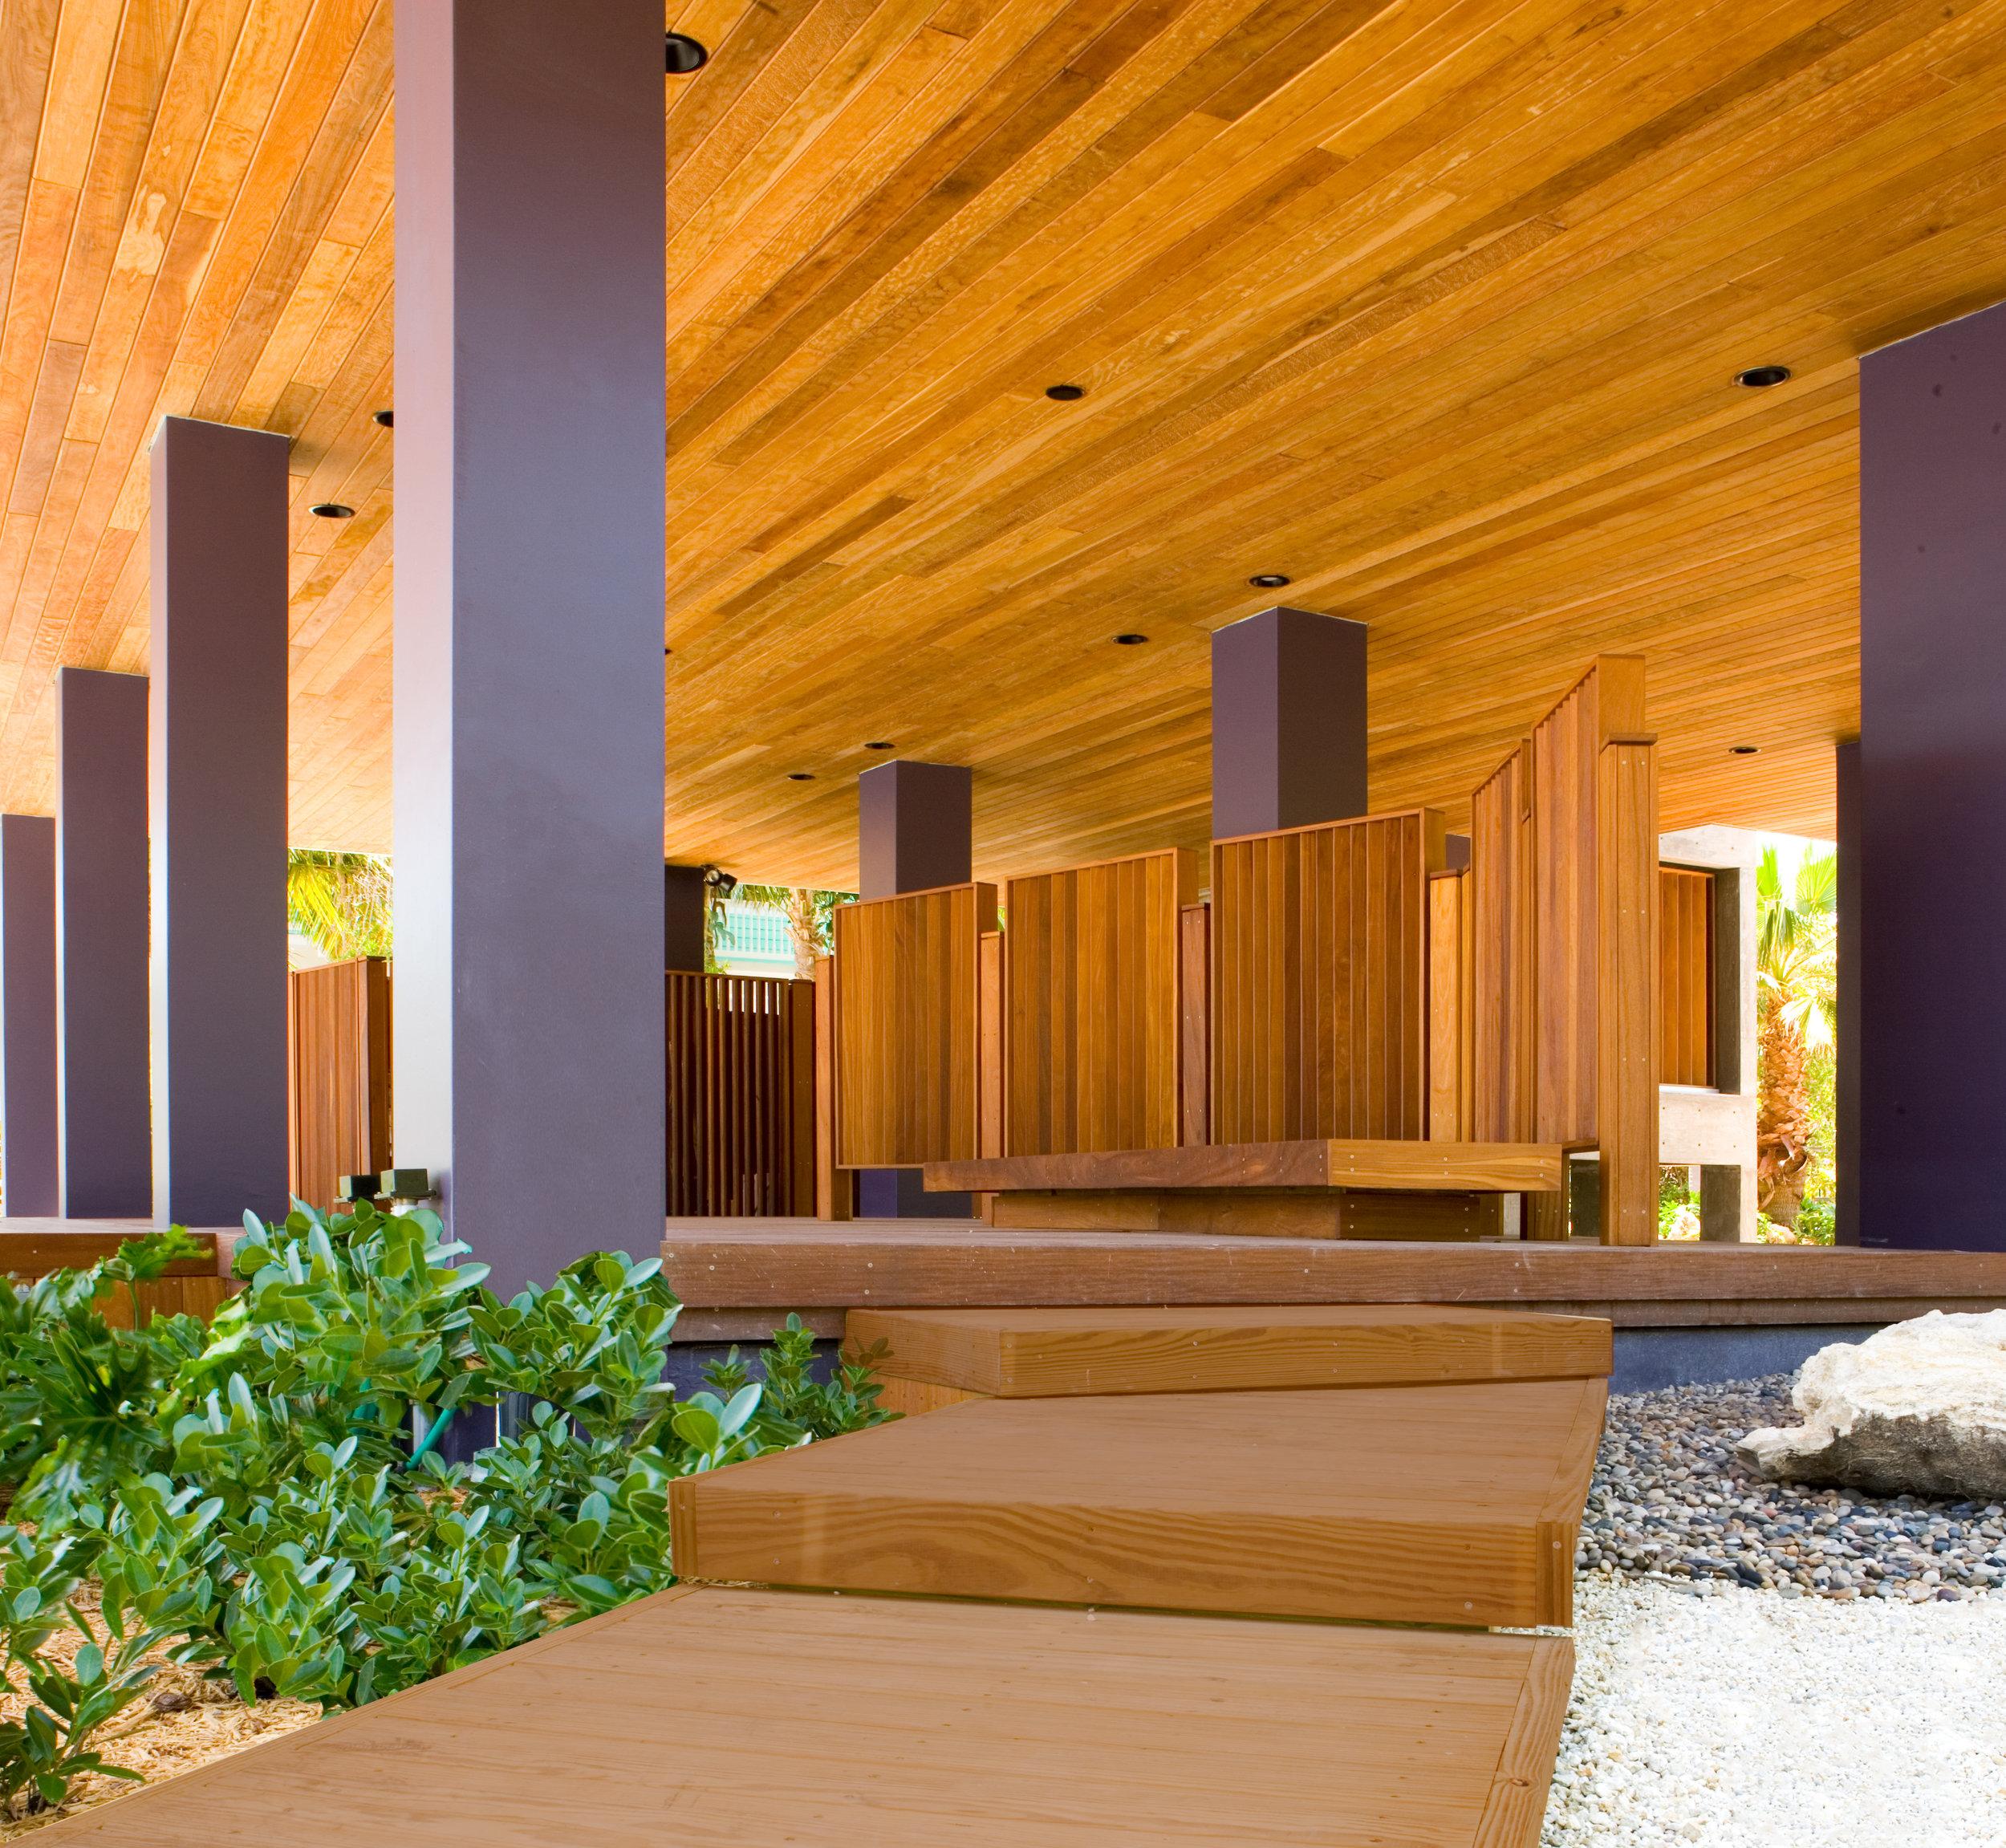 interior-house-tropical-hotel-hospitality_miami_4b.jpg